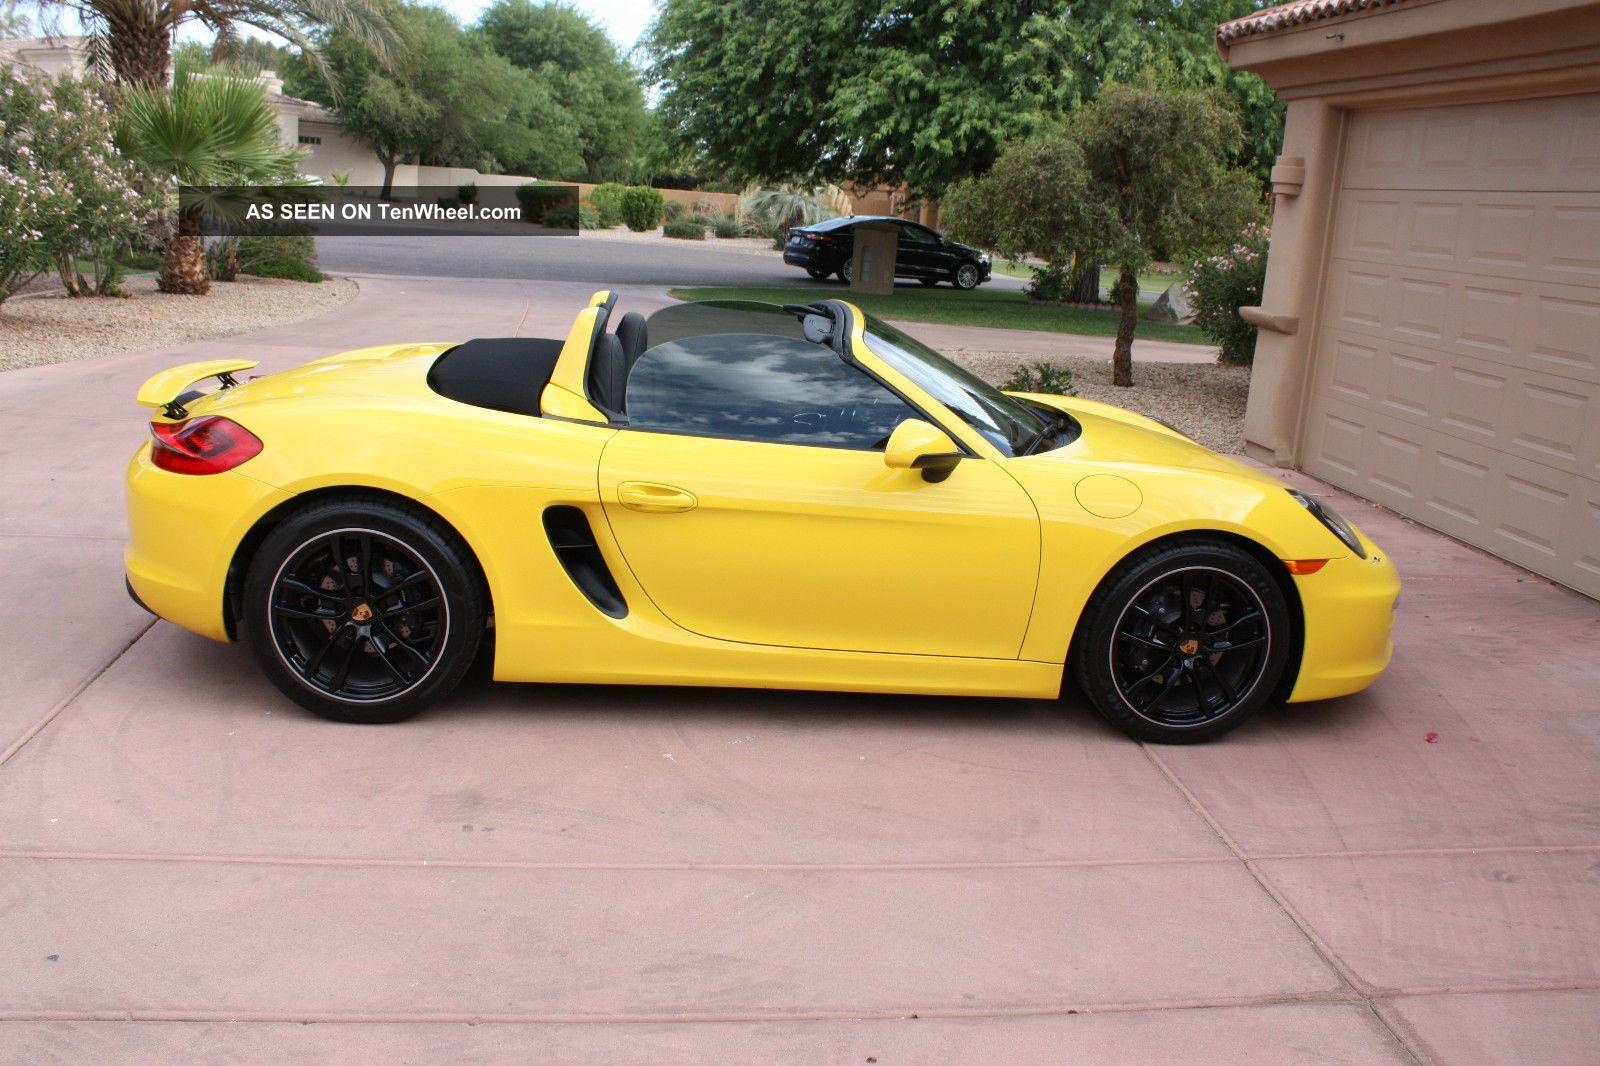 2014 Porsche Boxster Yellow With Black Rims